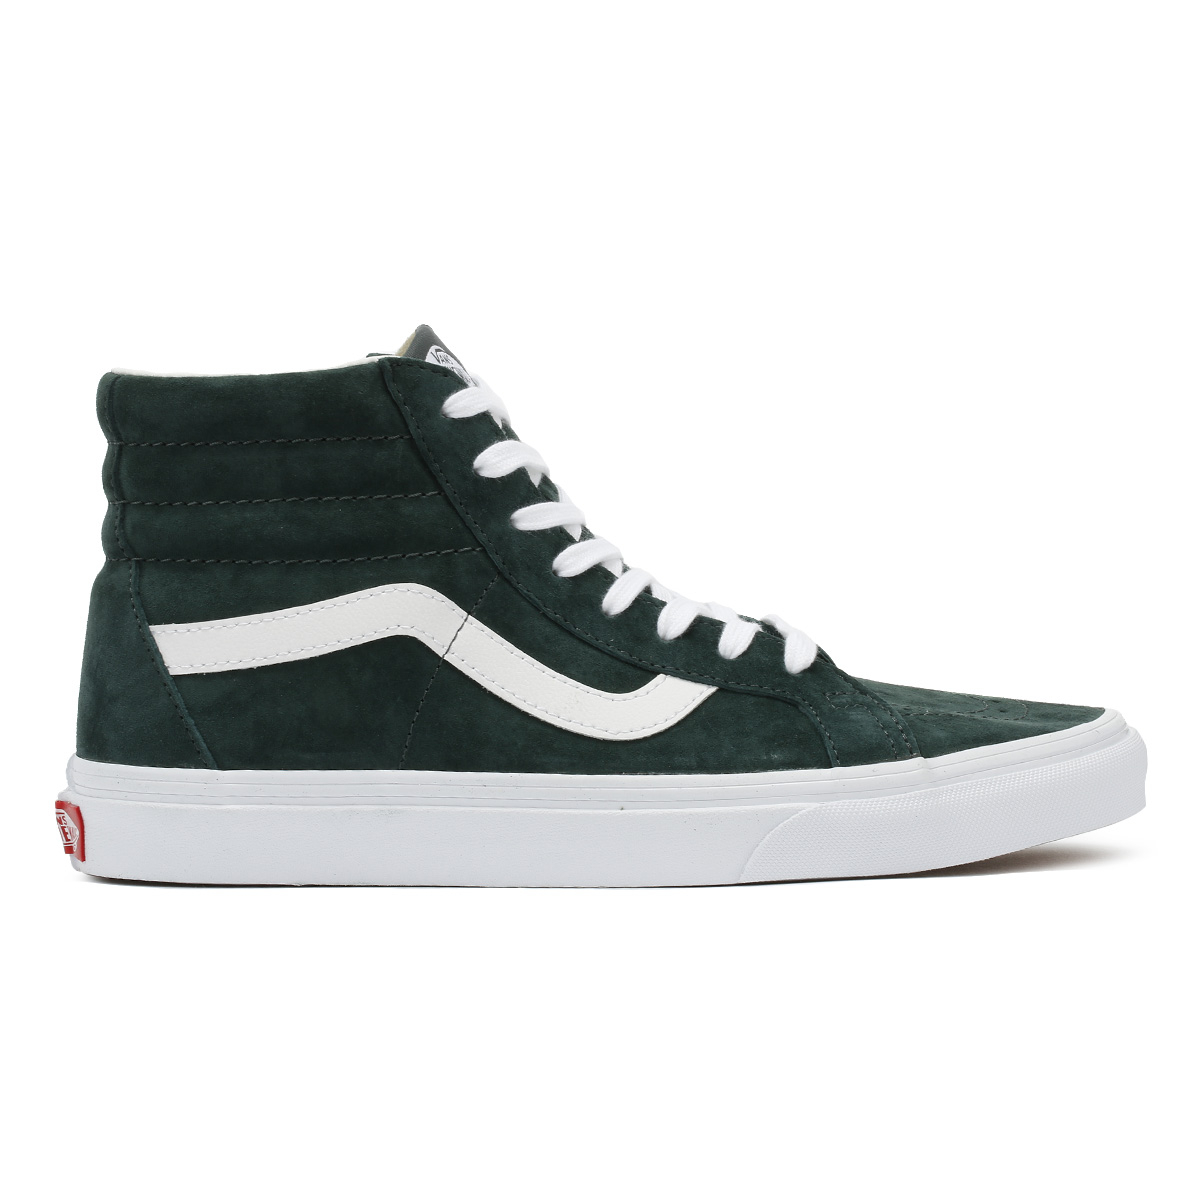 Sk8 Zapatos Darkest skate Spruce Vans de Entrenadores hi Green Sport Reissue Hombres ocasionales wXqS6URp